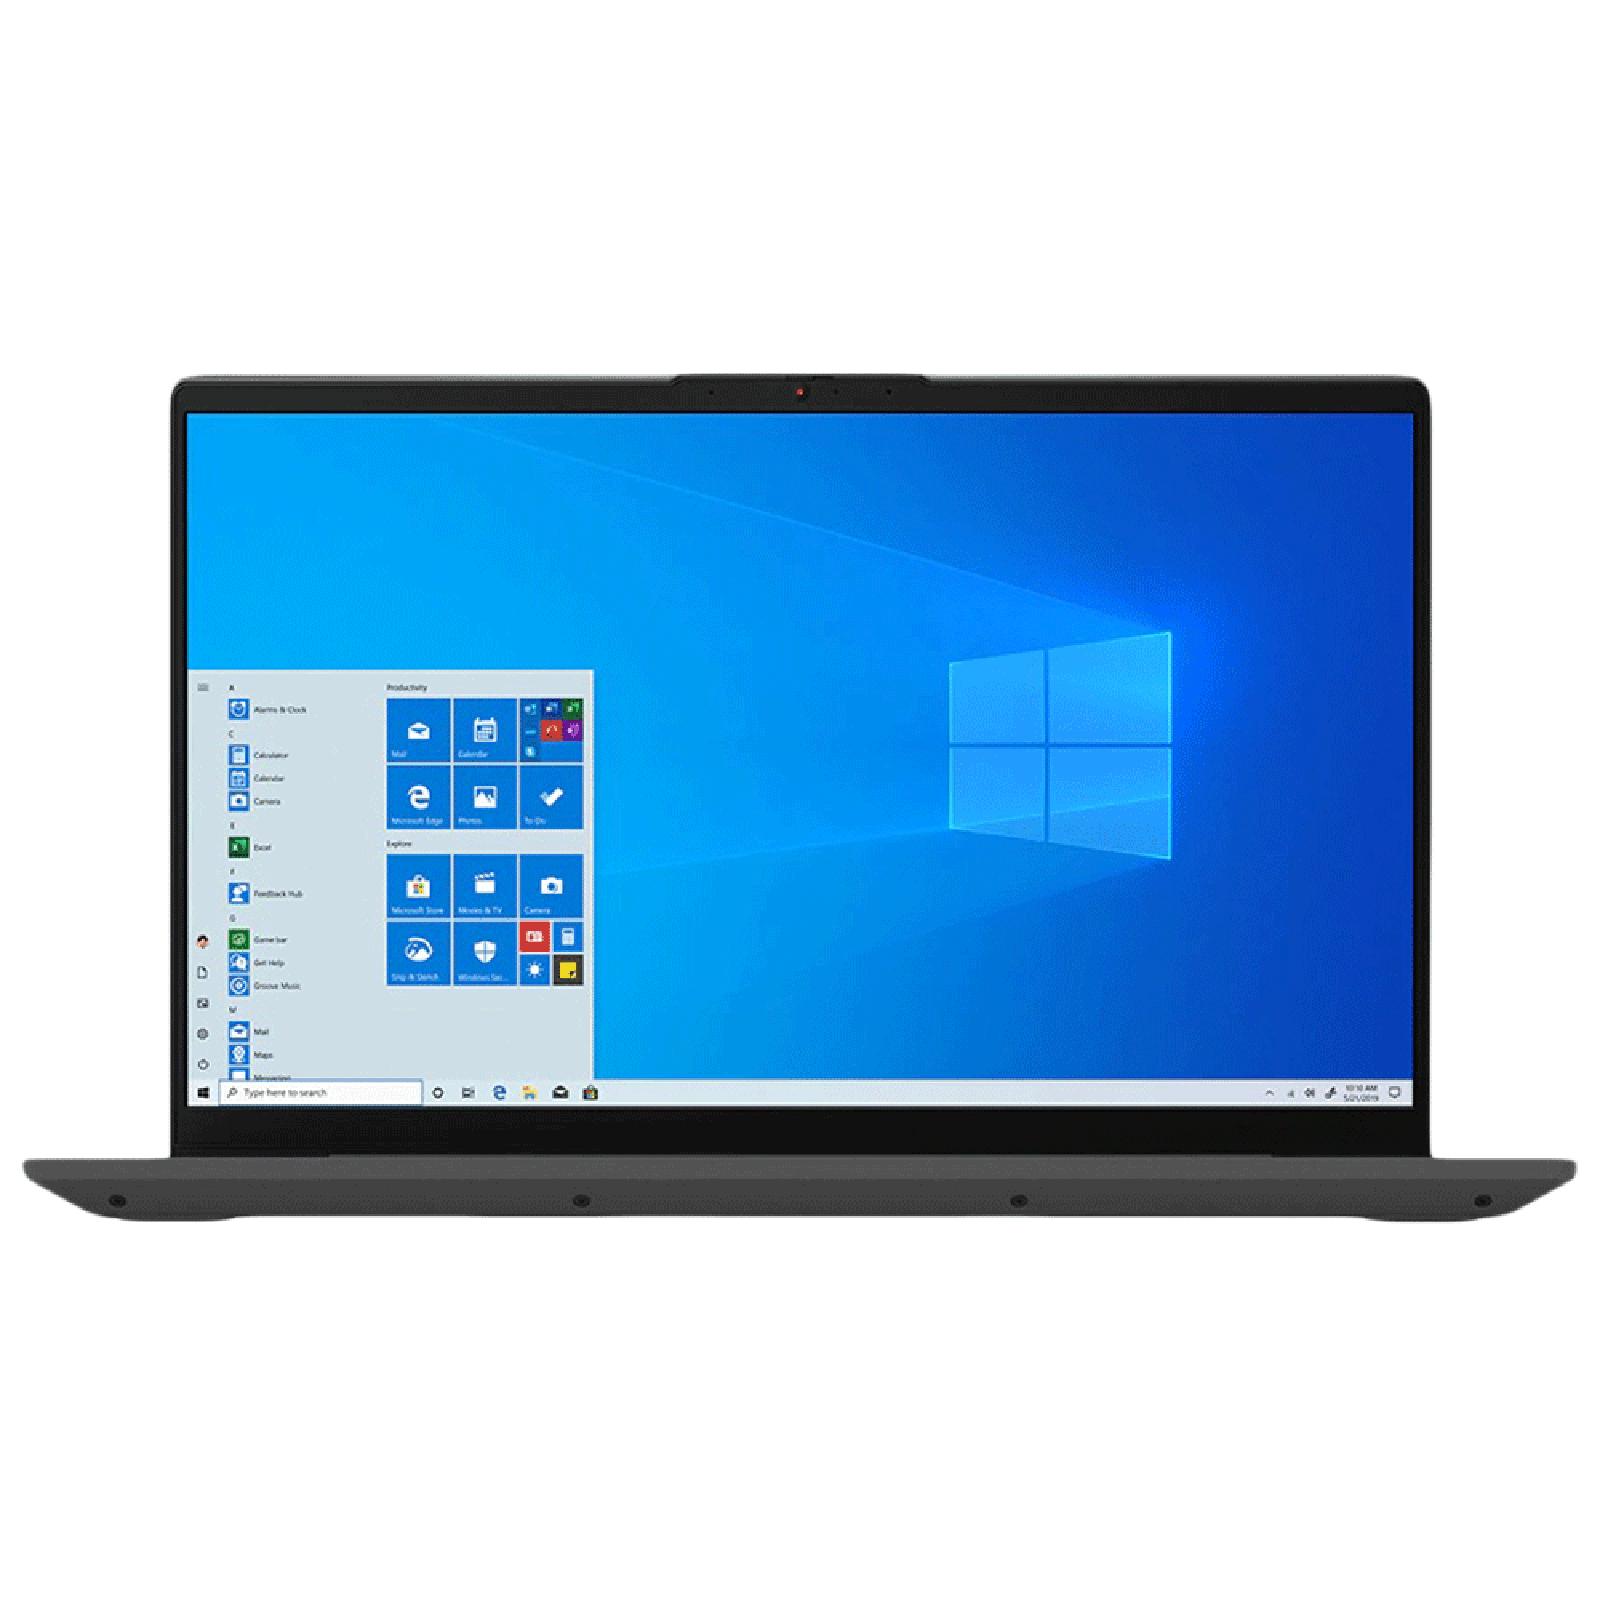 Lenovo IdeaPad 5 15ITL05 (82FG010AIN) Corei5 11th Gen Windows 10 Home Thin and Light Laptop (8GB RAM, 1TB HDD, 256GB SSD, NVIDIA GeForce MX450 + 2GB Graphics, MS Office, 39.62cm, Graphite Grey)_1